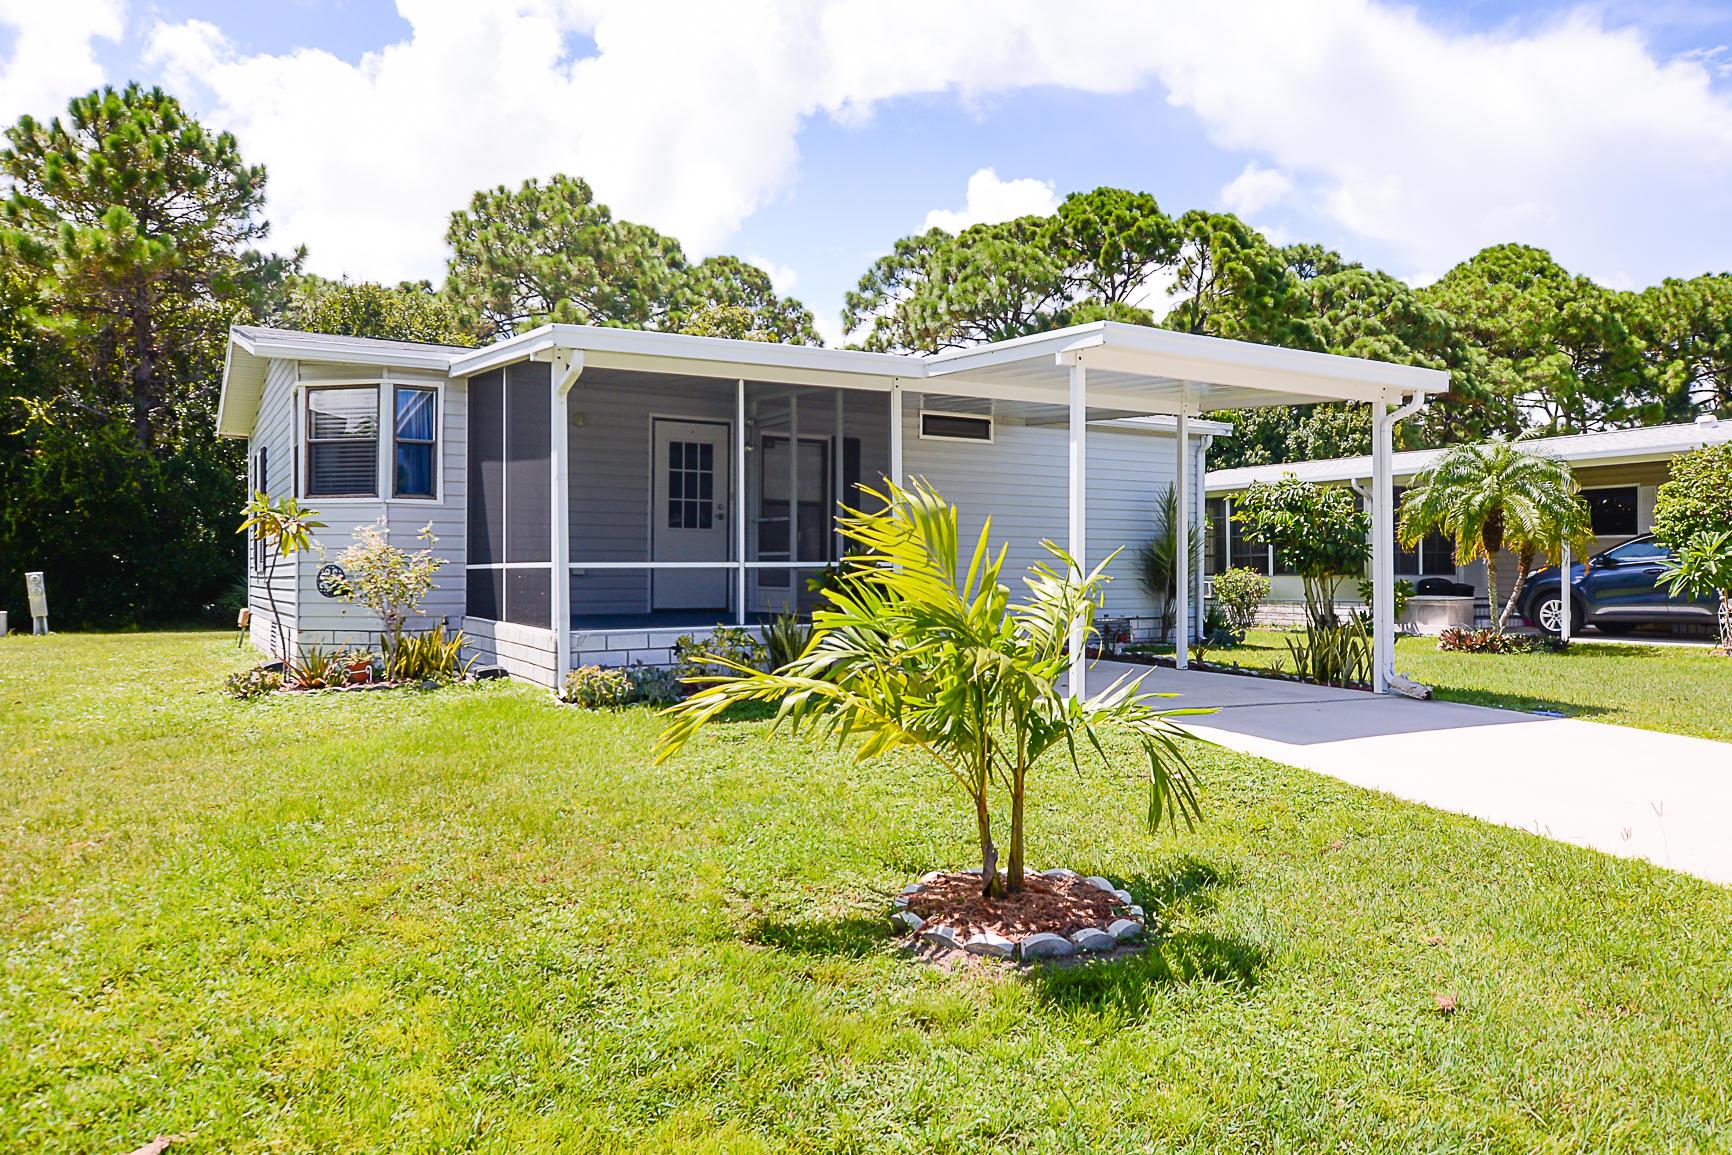 202 Mangrove Bay Place, Fort Pierce, FL 34982